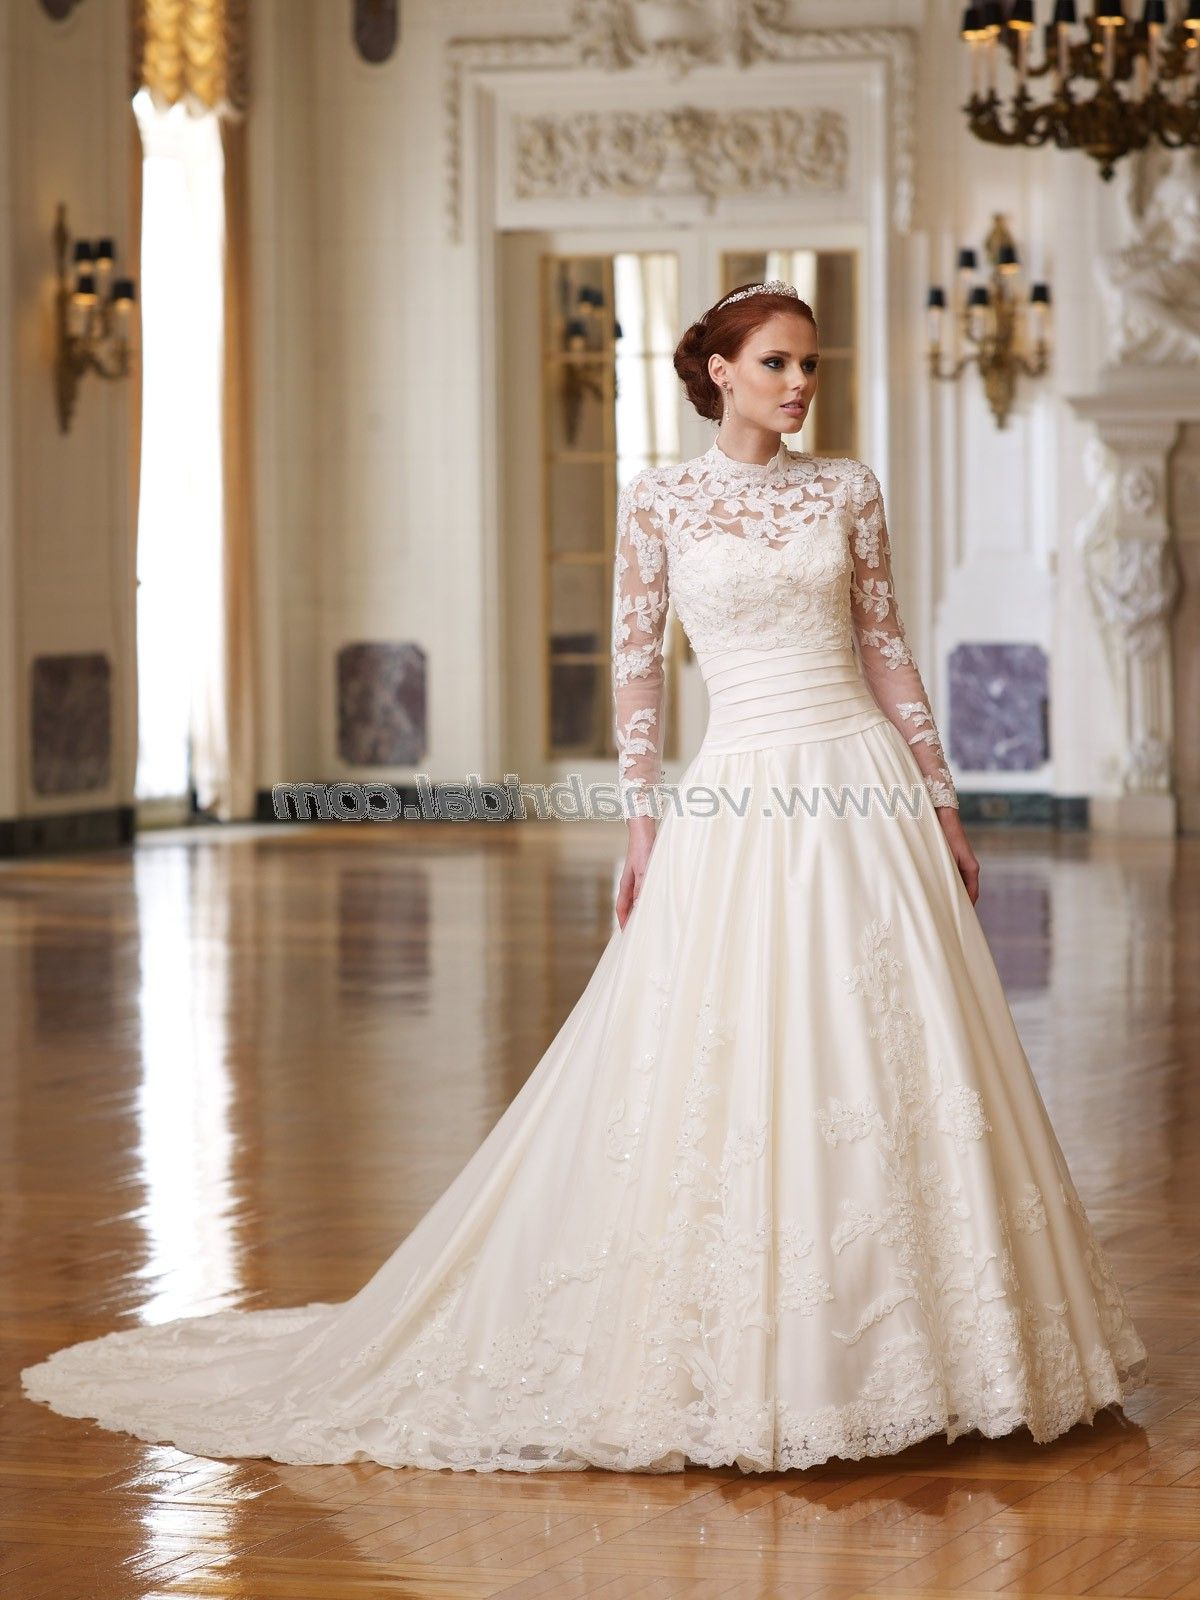 Long sleeve wedding dresses adelaide longsleeve dress pinterest